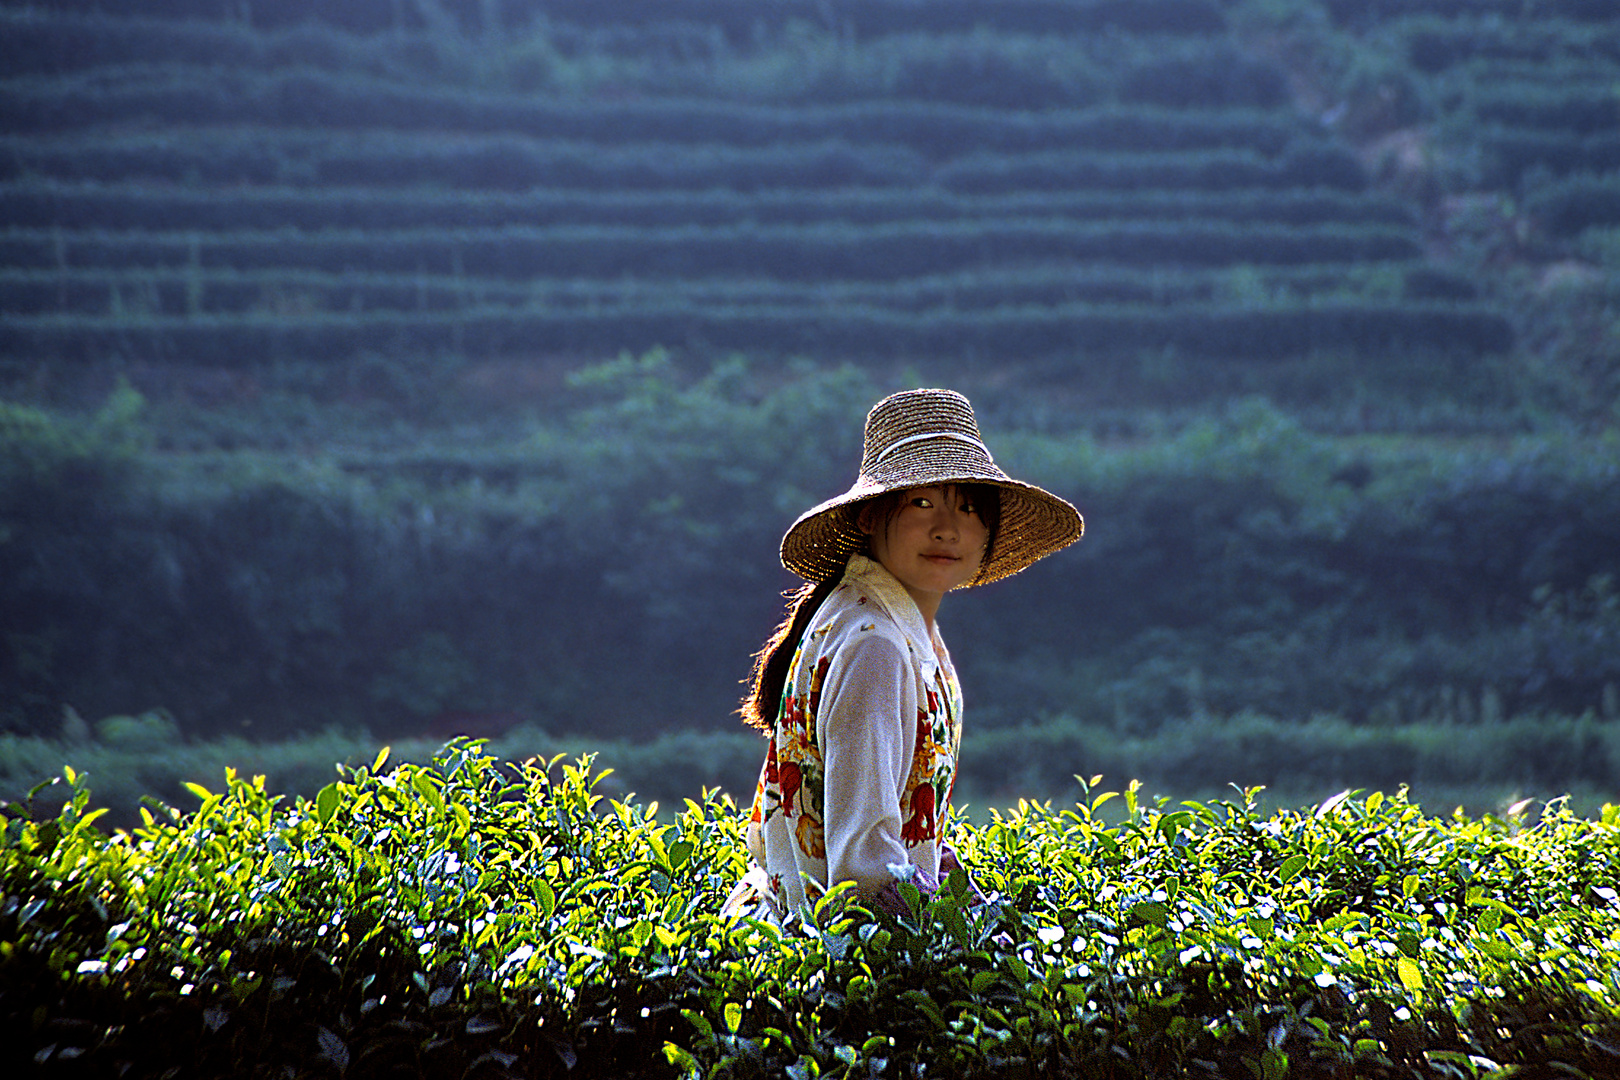 Teepflückerin in China